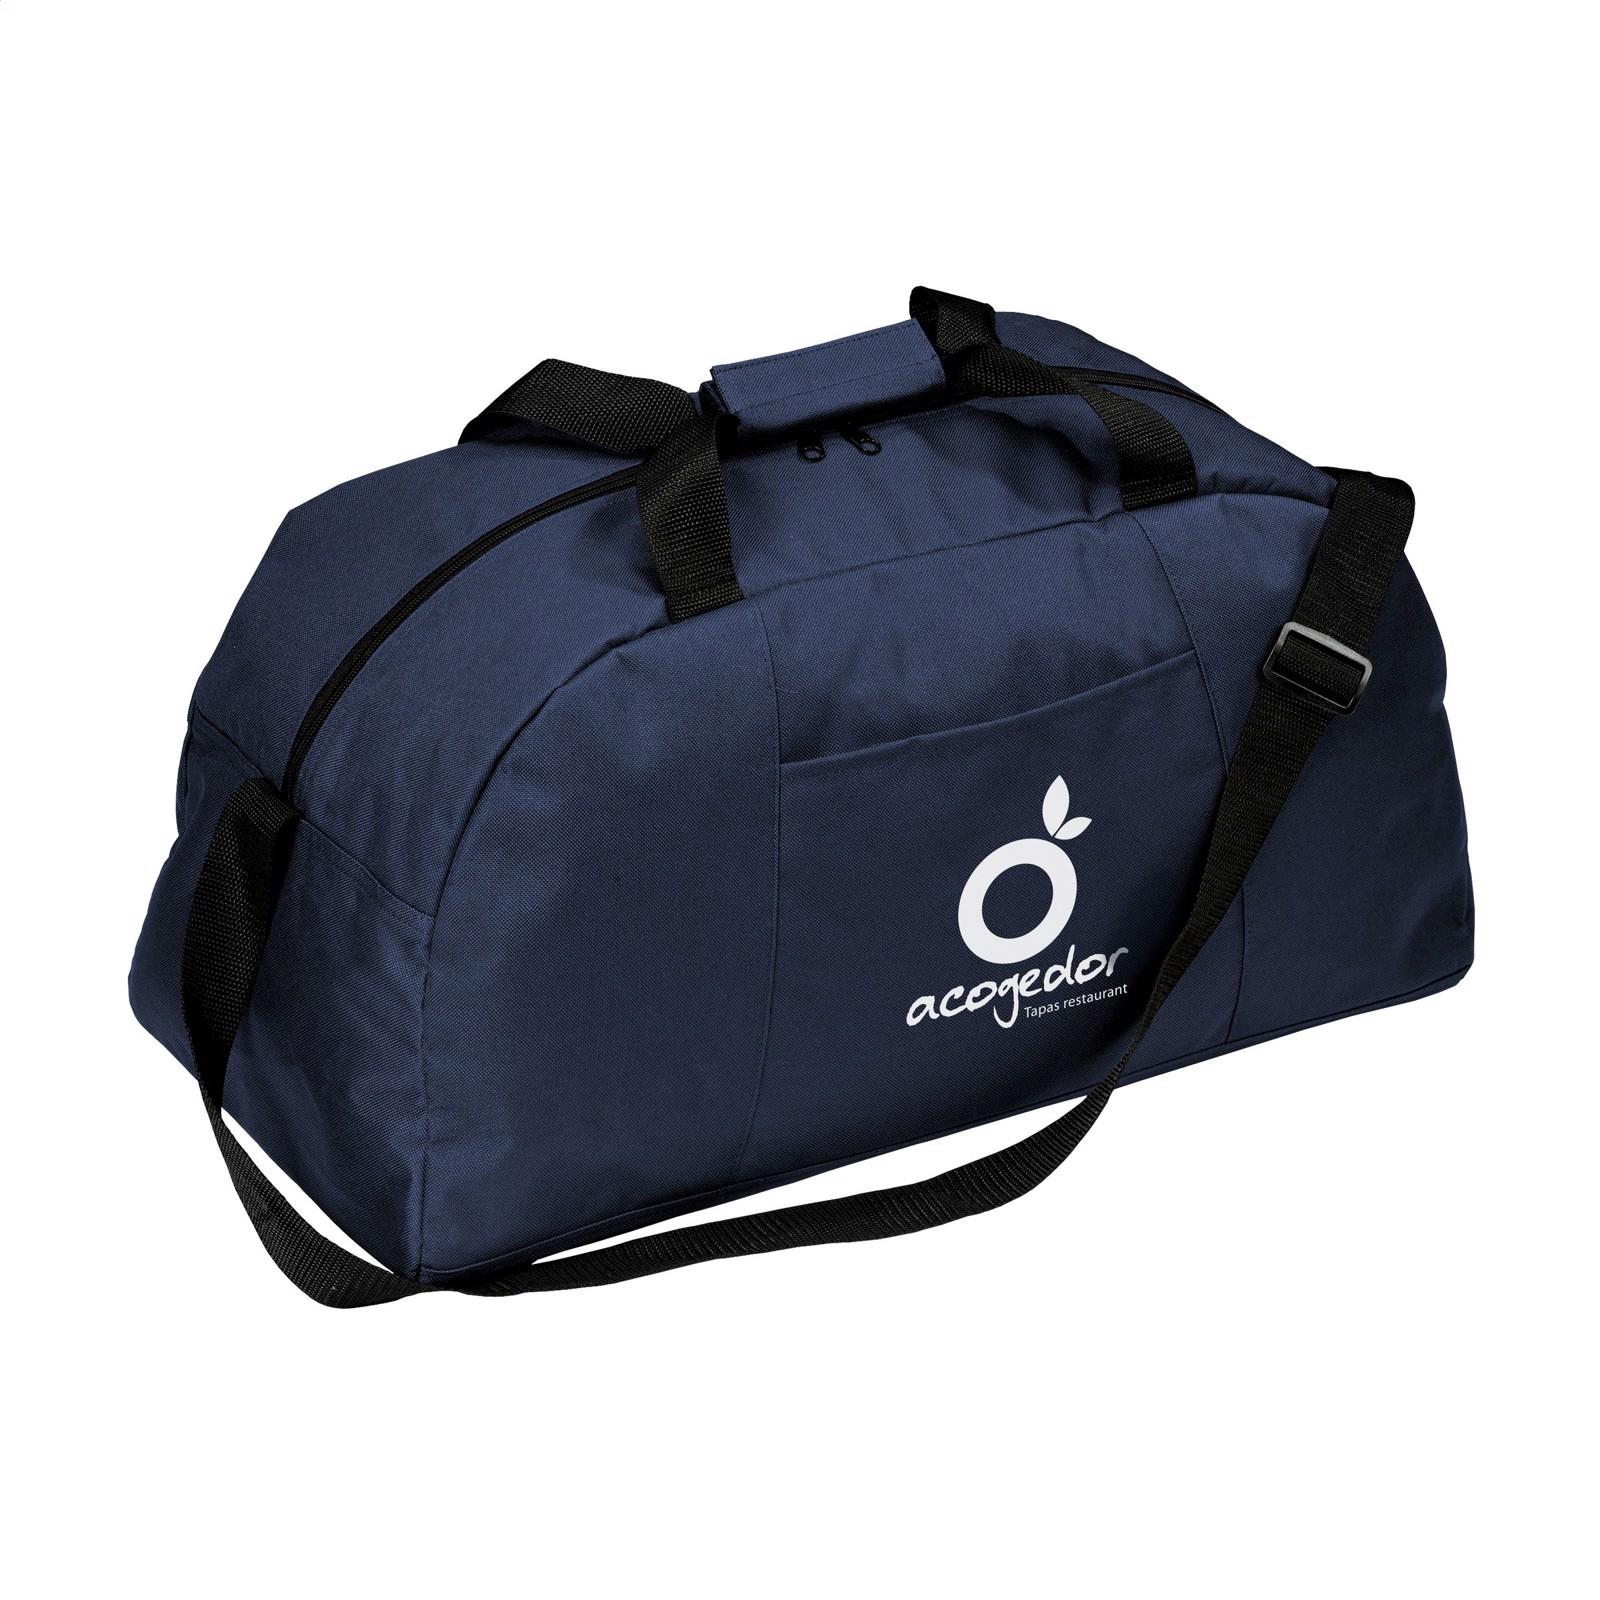 TrendBag sports/travel bag - Dark Blue